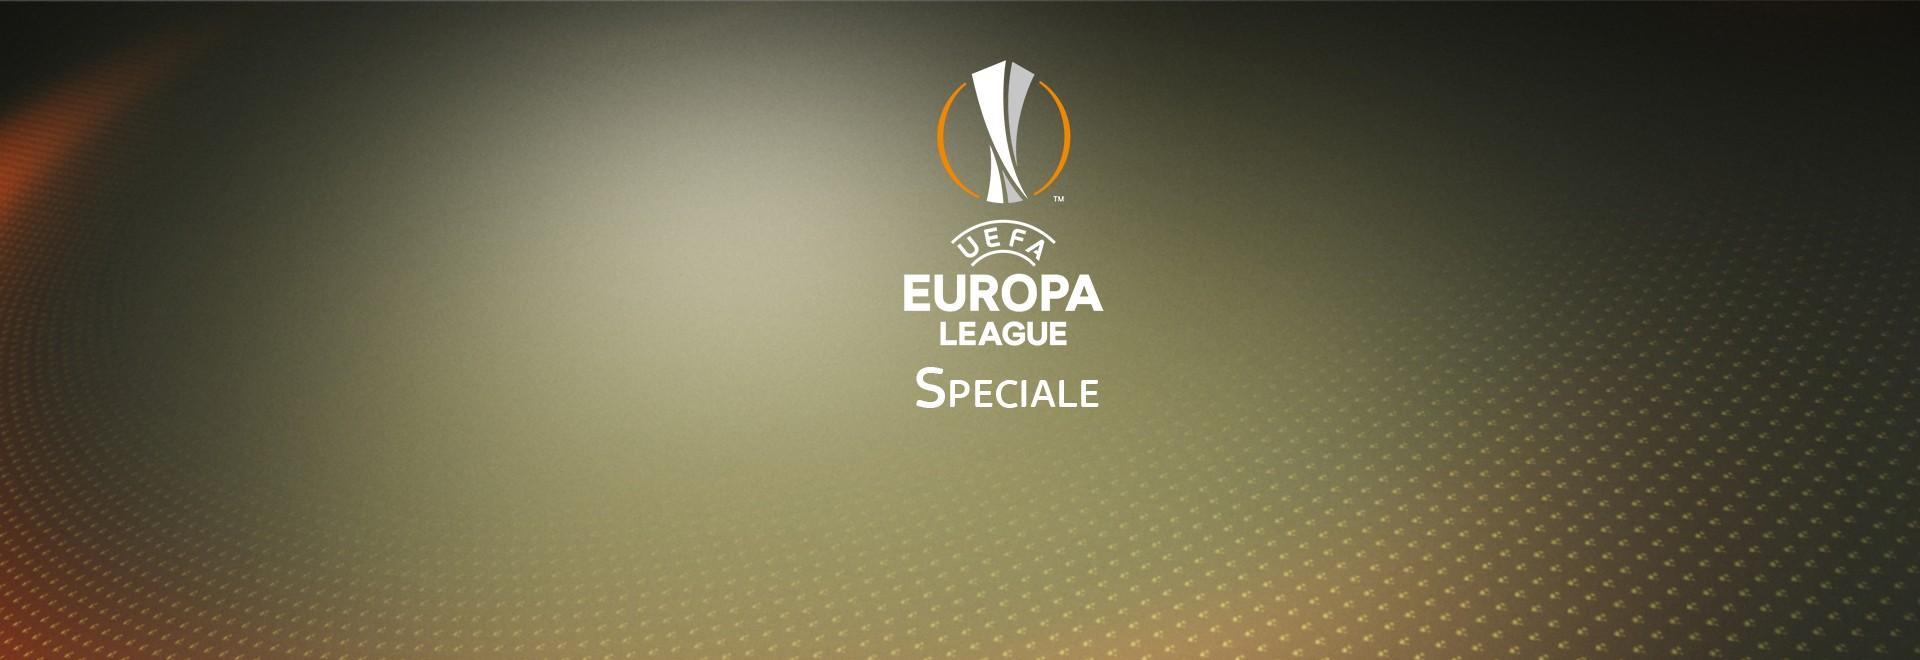 Speciale Europa League 2017